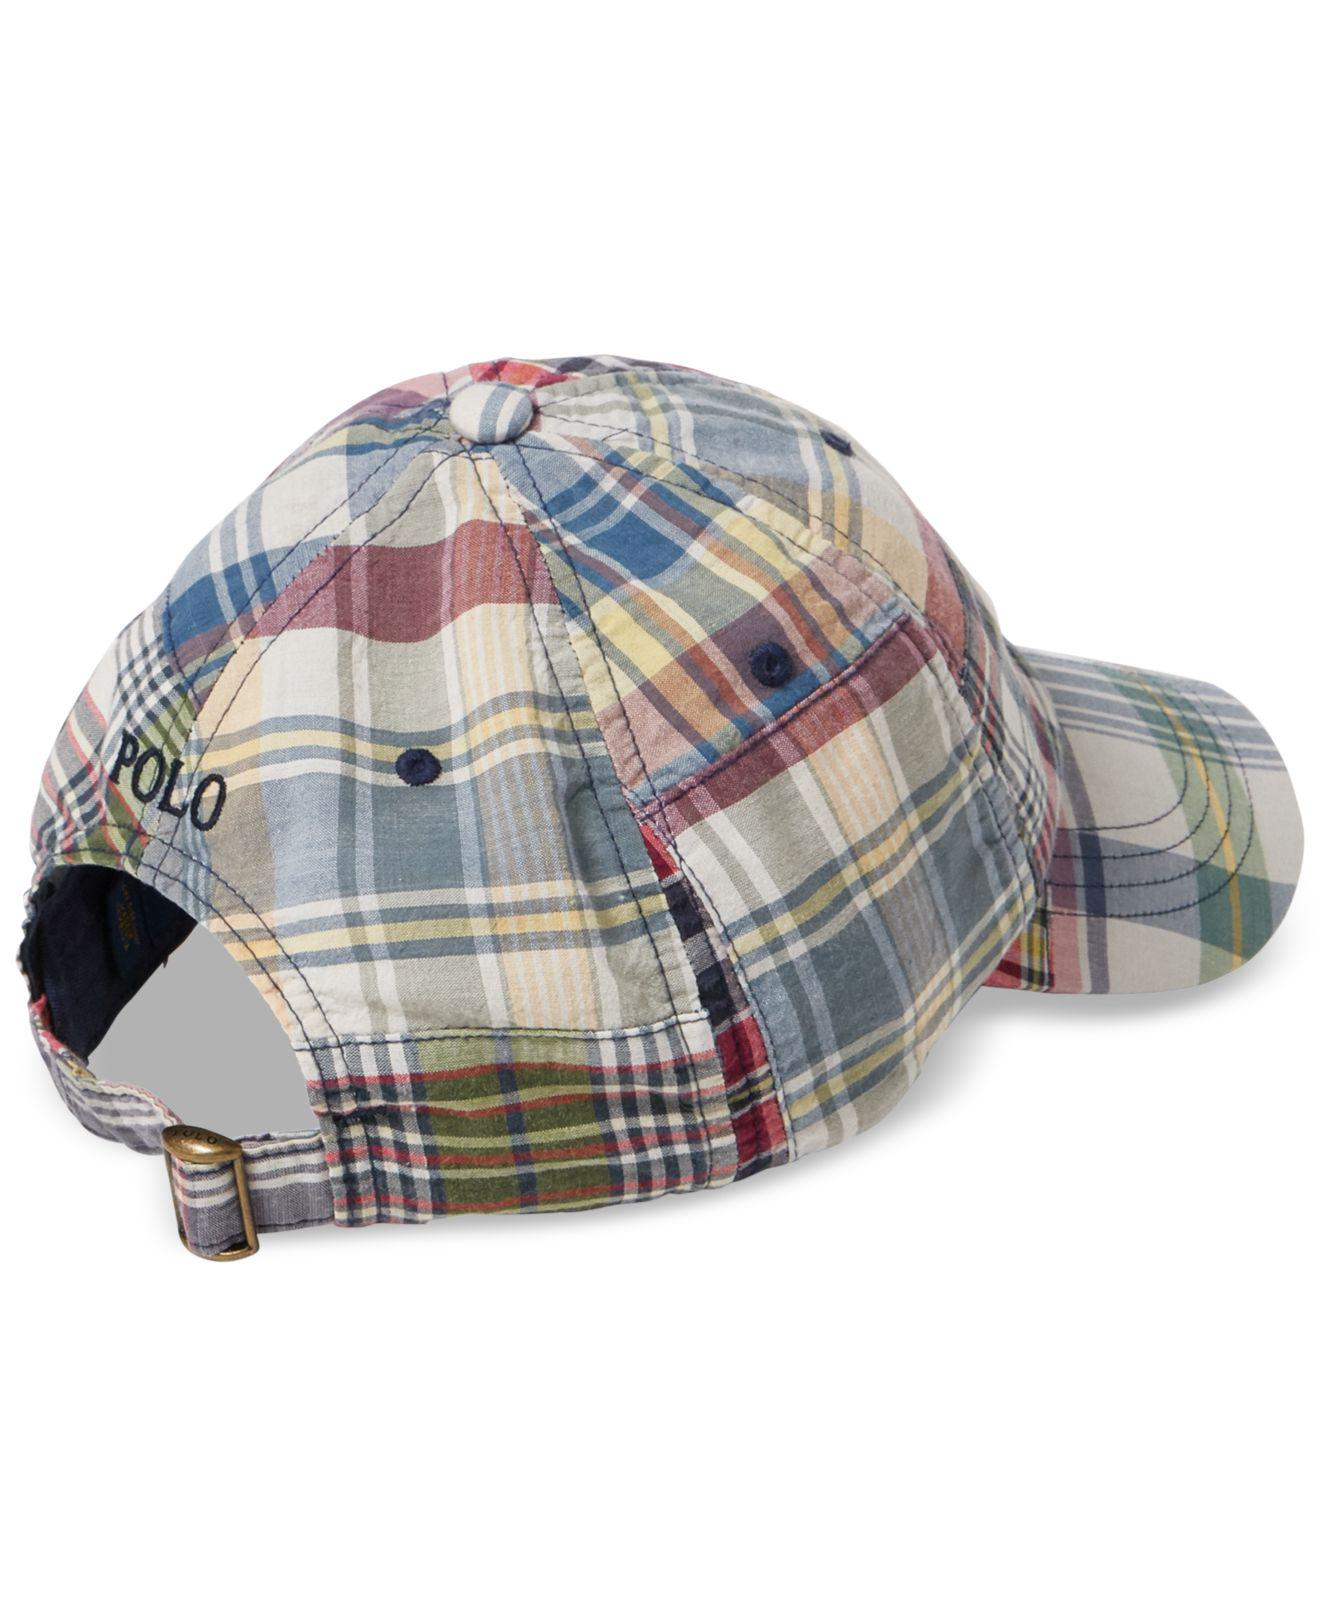 33201949d Polo Ralph Lauren Madras Baseball Cap for Men - Lyst